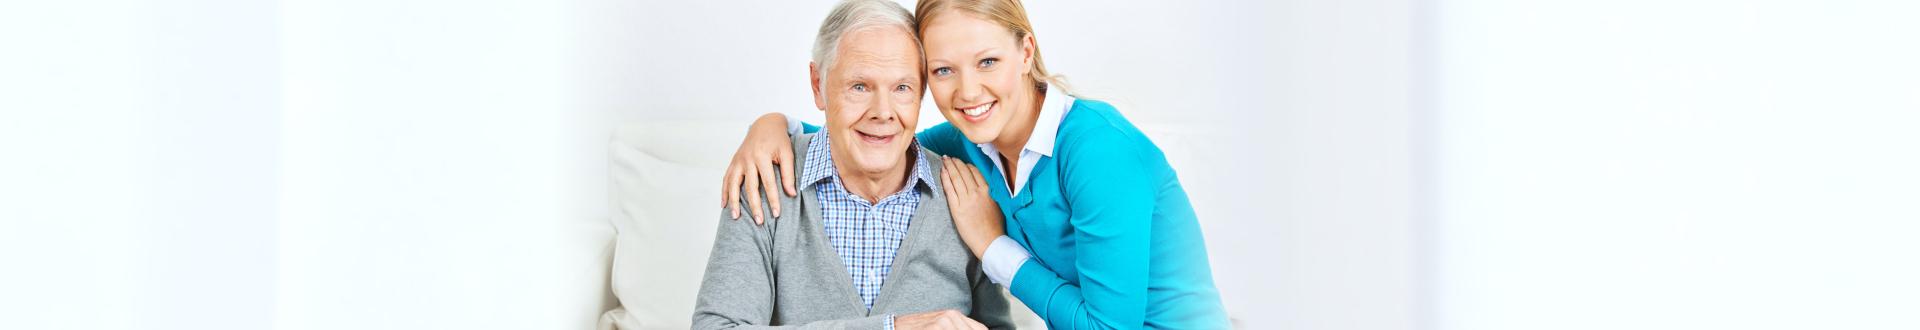 caregiver hugging senior man